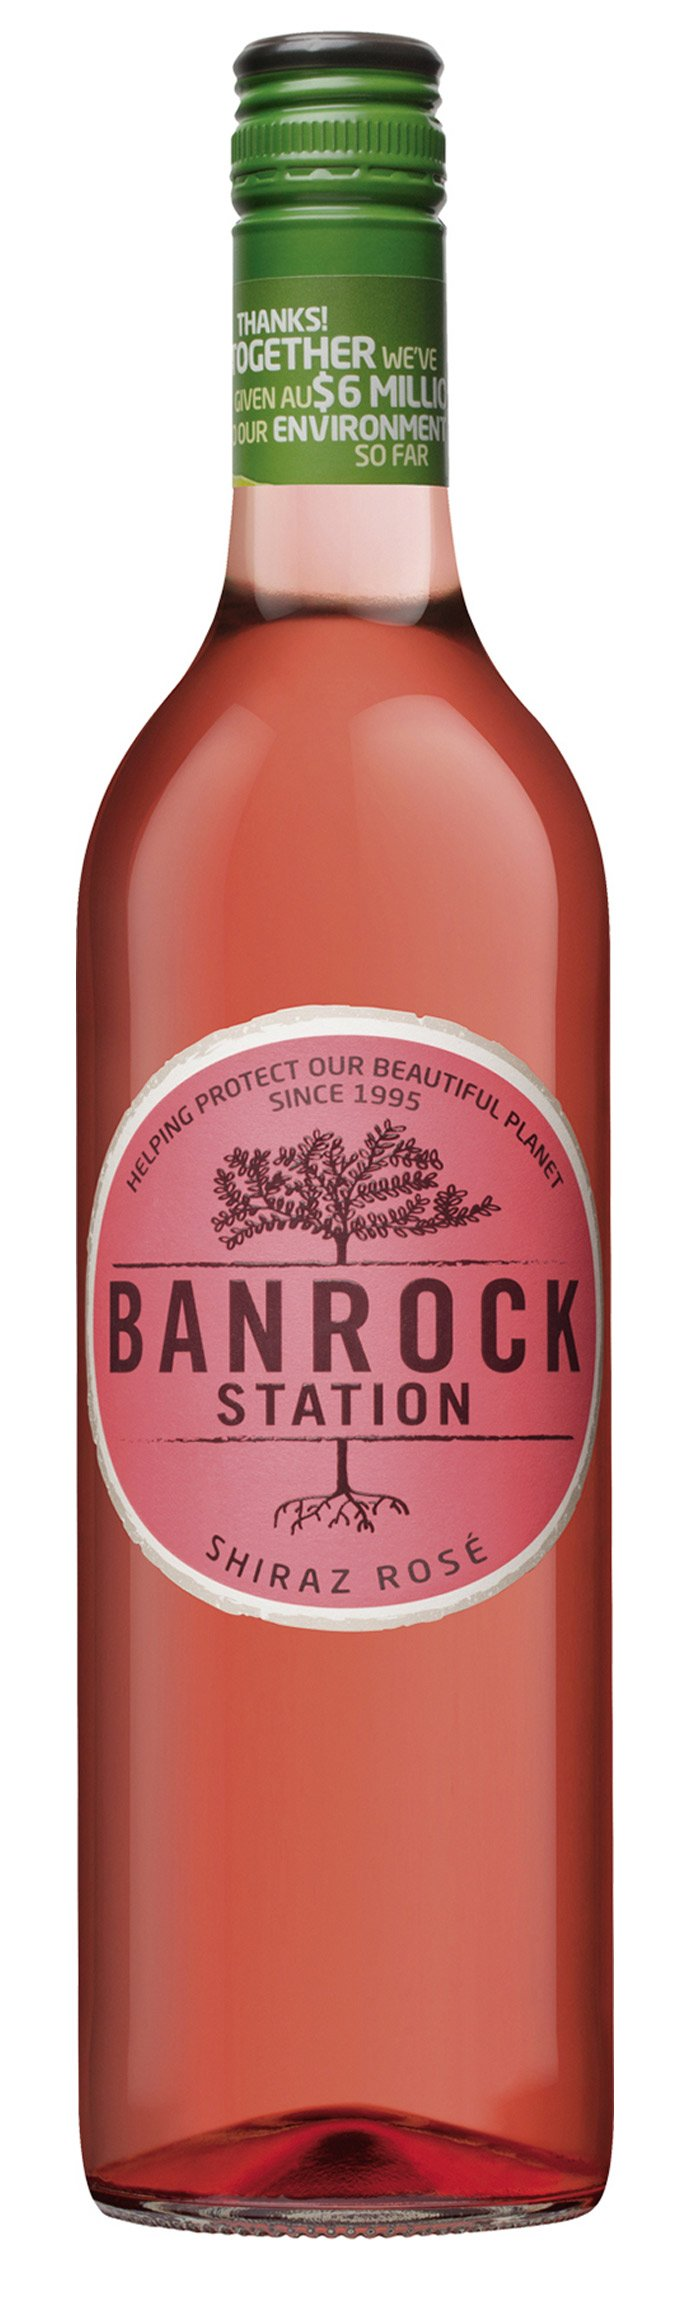 Banrock-Station-Shiraz-Ros-Rose-2016-Halbtrocken-6-x-075-l